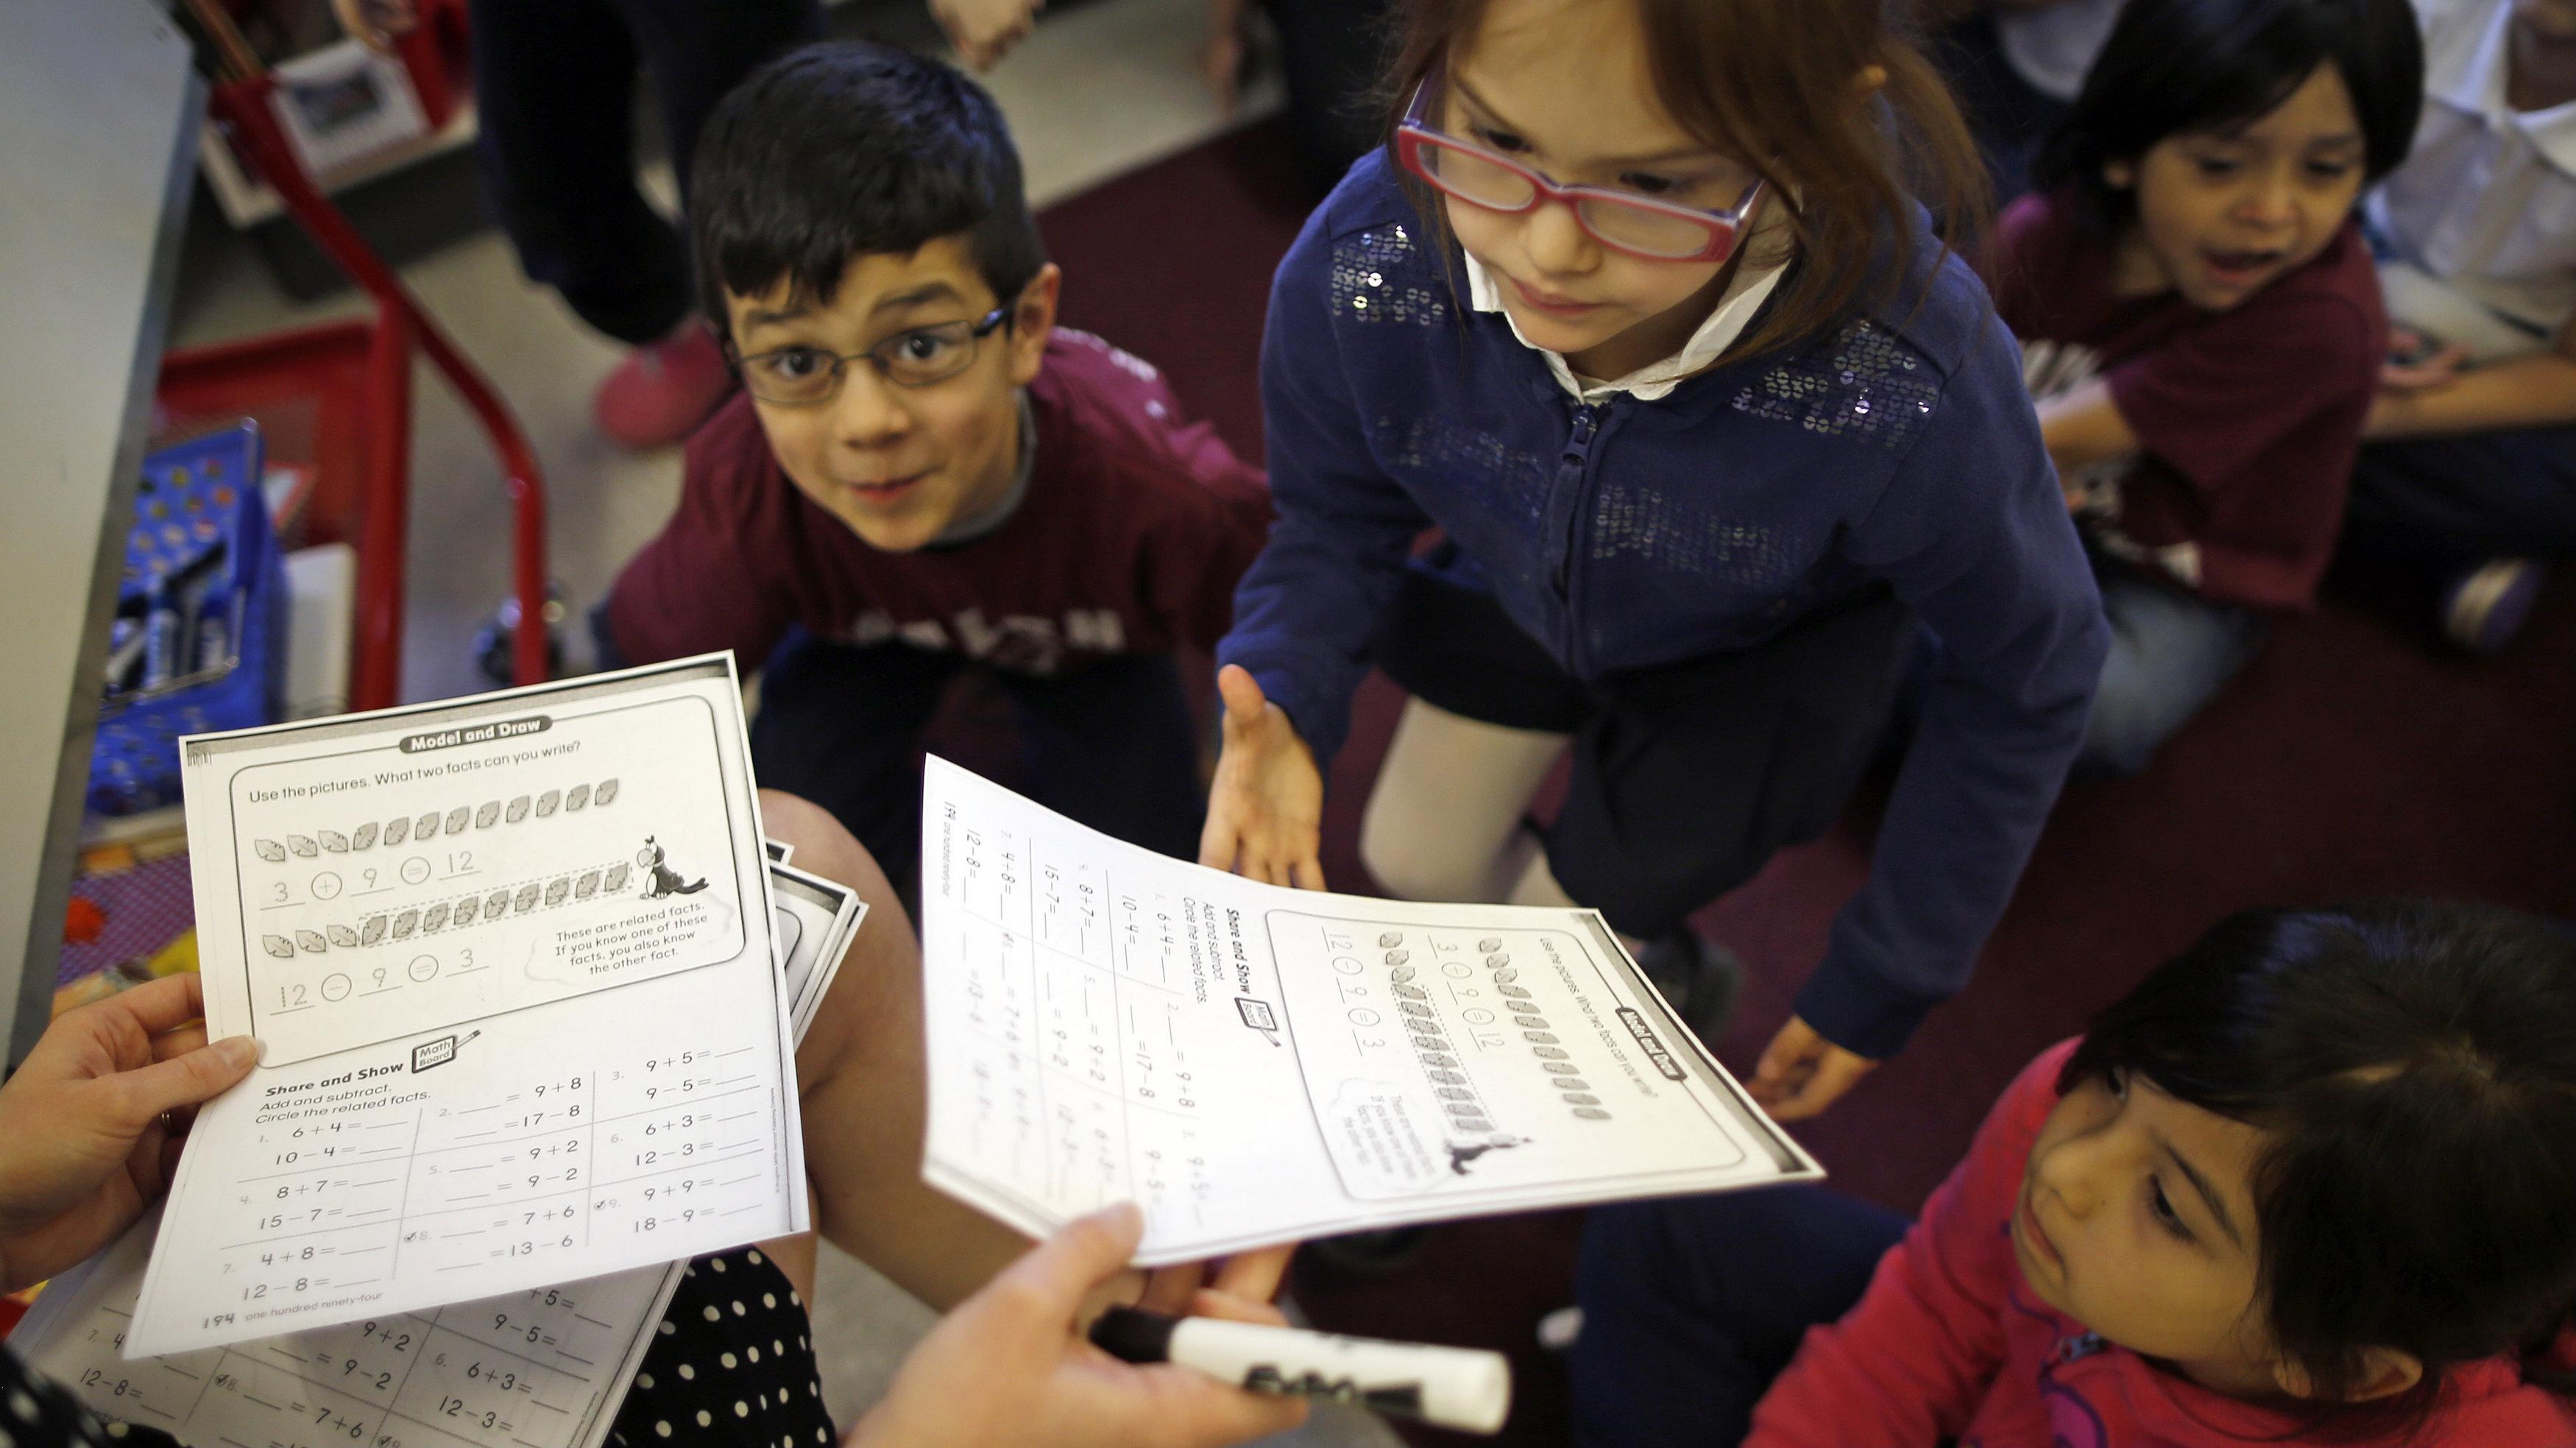 children being given worksheets